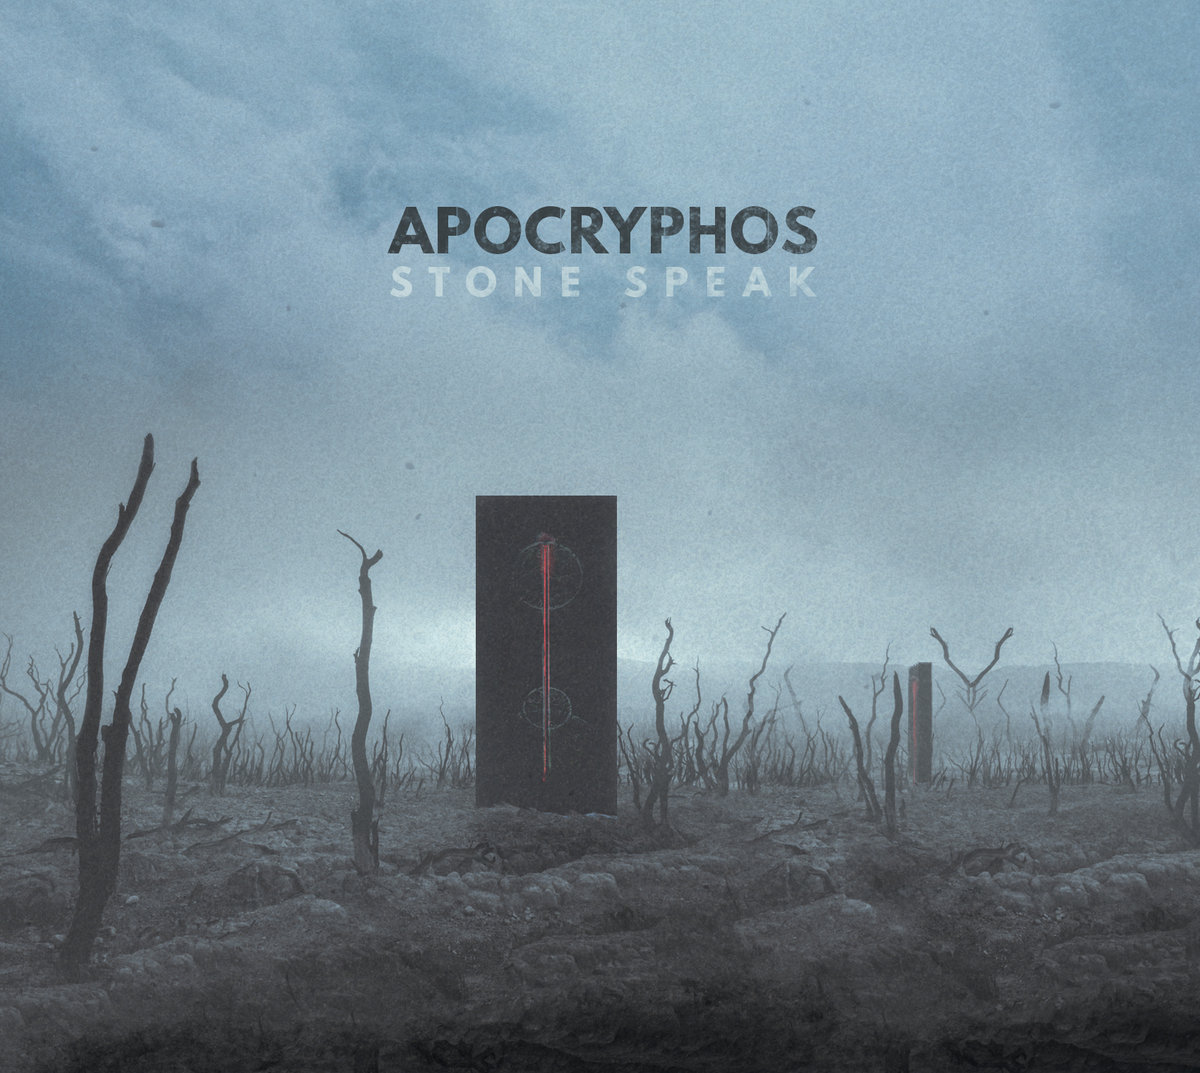 Apocryphos: Stone Speak